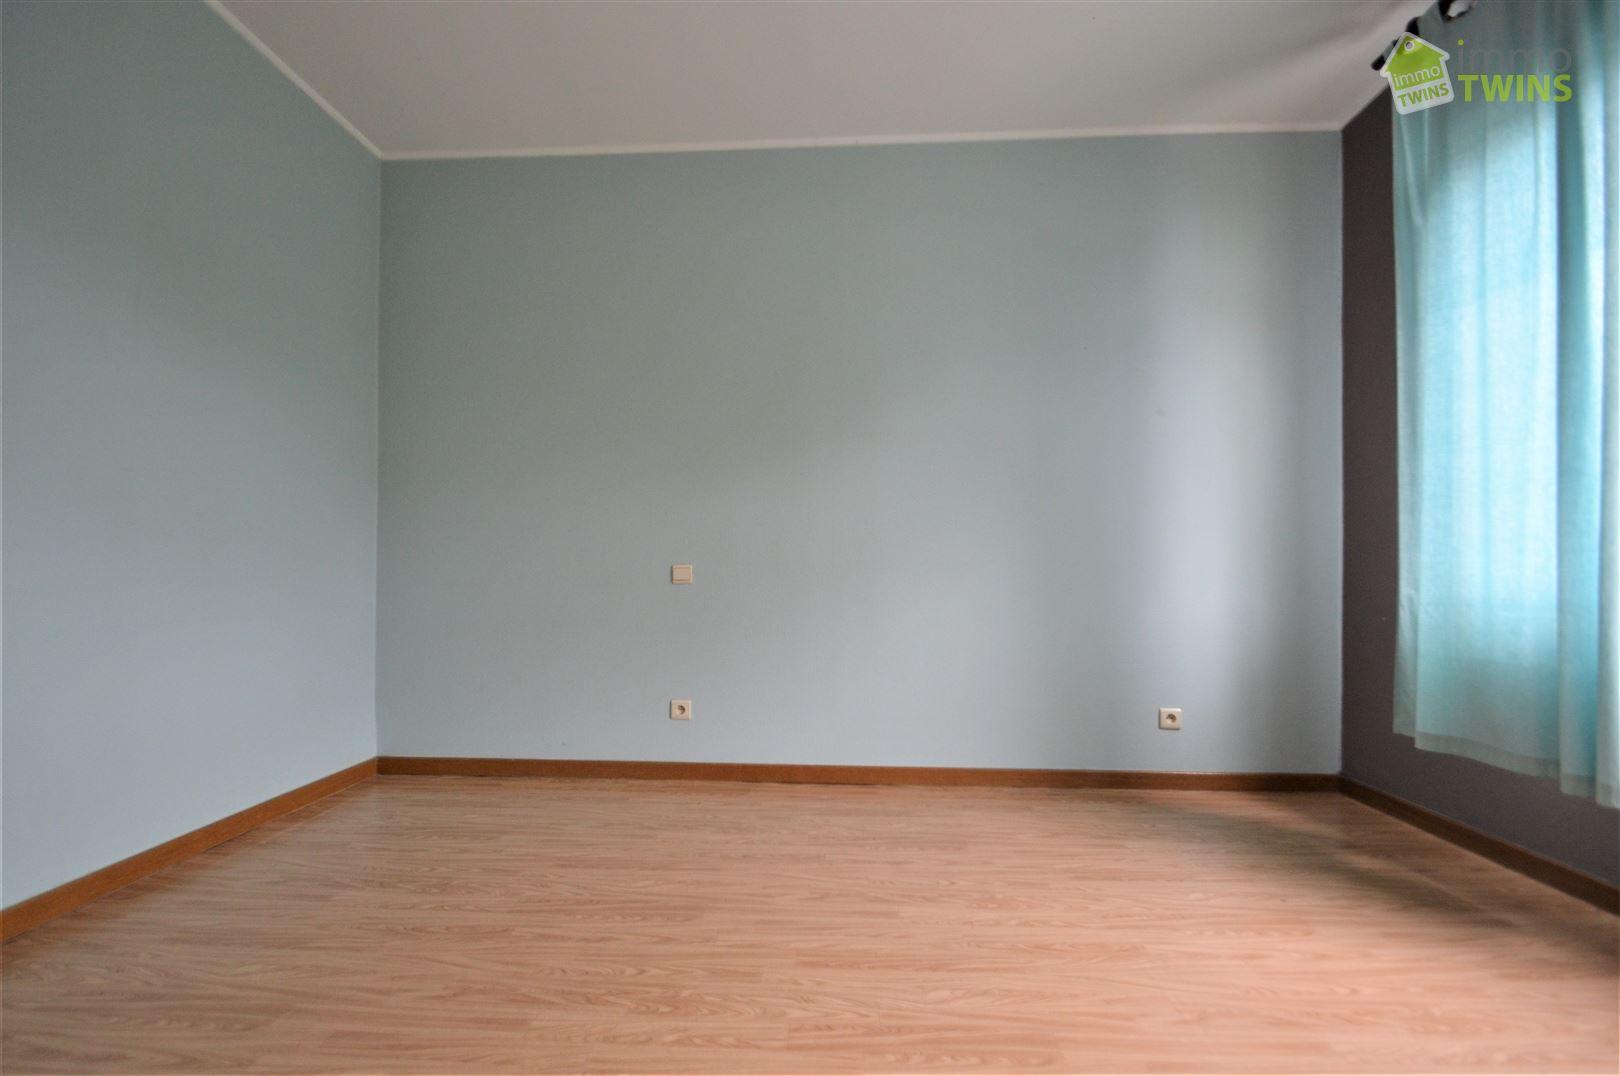 Foto 9 : Appartement te 9200 DENDERMONDE (België) - Prijs € 575